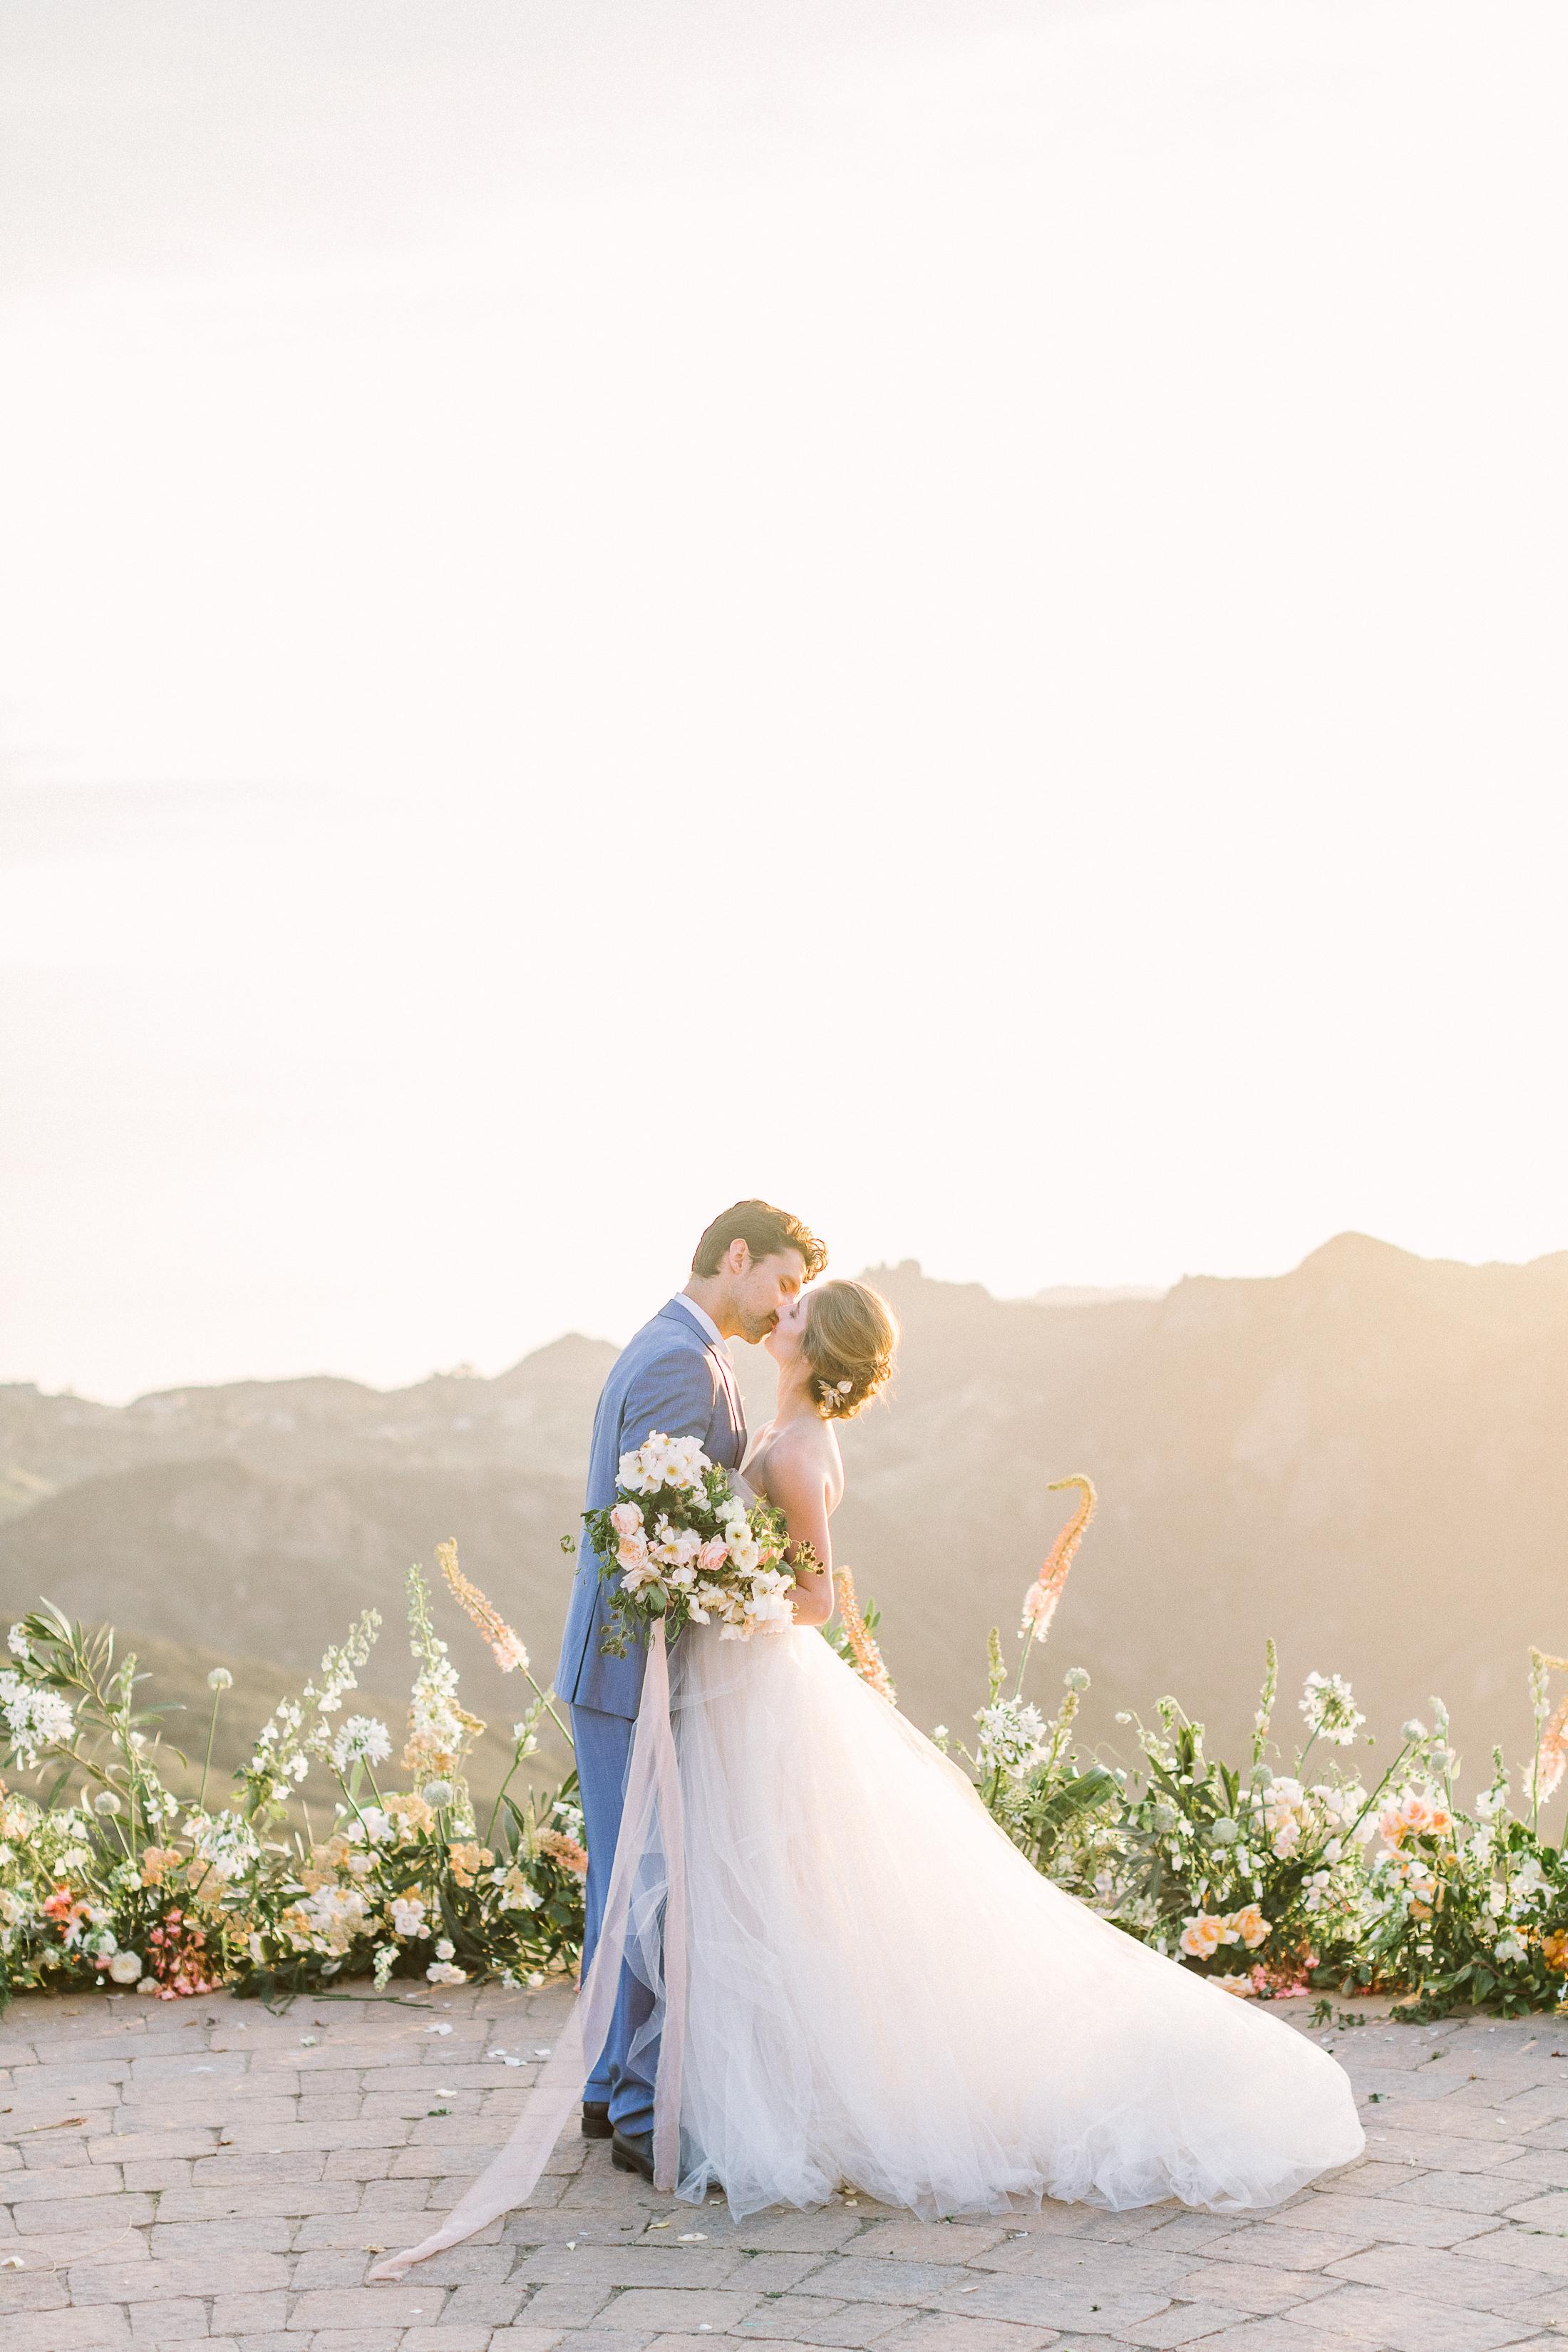 Ellen-Ashton-Photography-California-Wedding-Photographer-Malibu-Rocky-Oaks-Weddings-girt-and-gold20.jpg